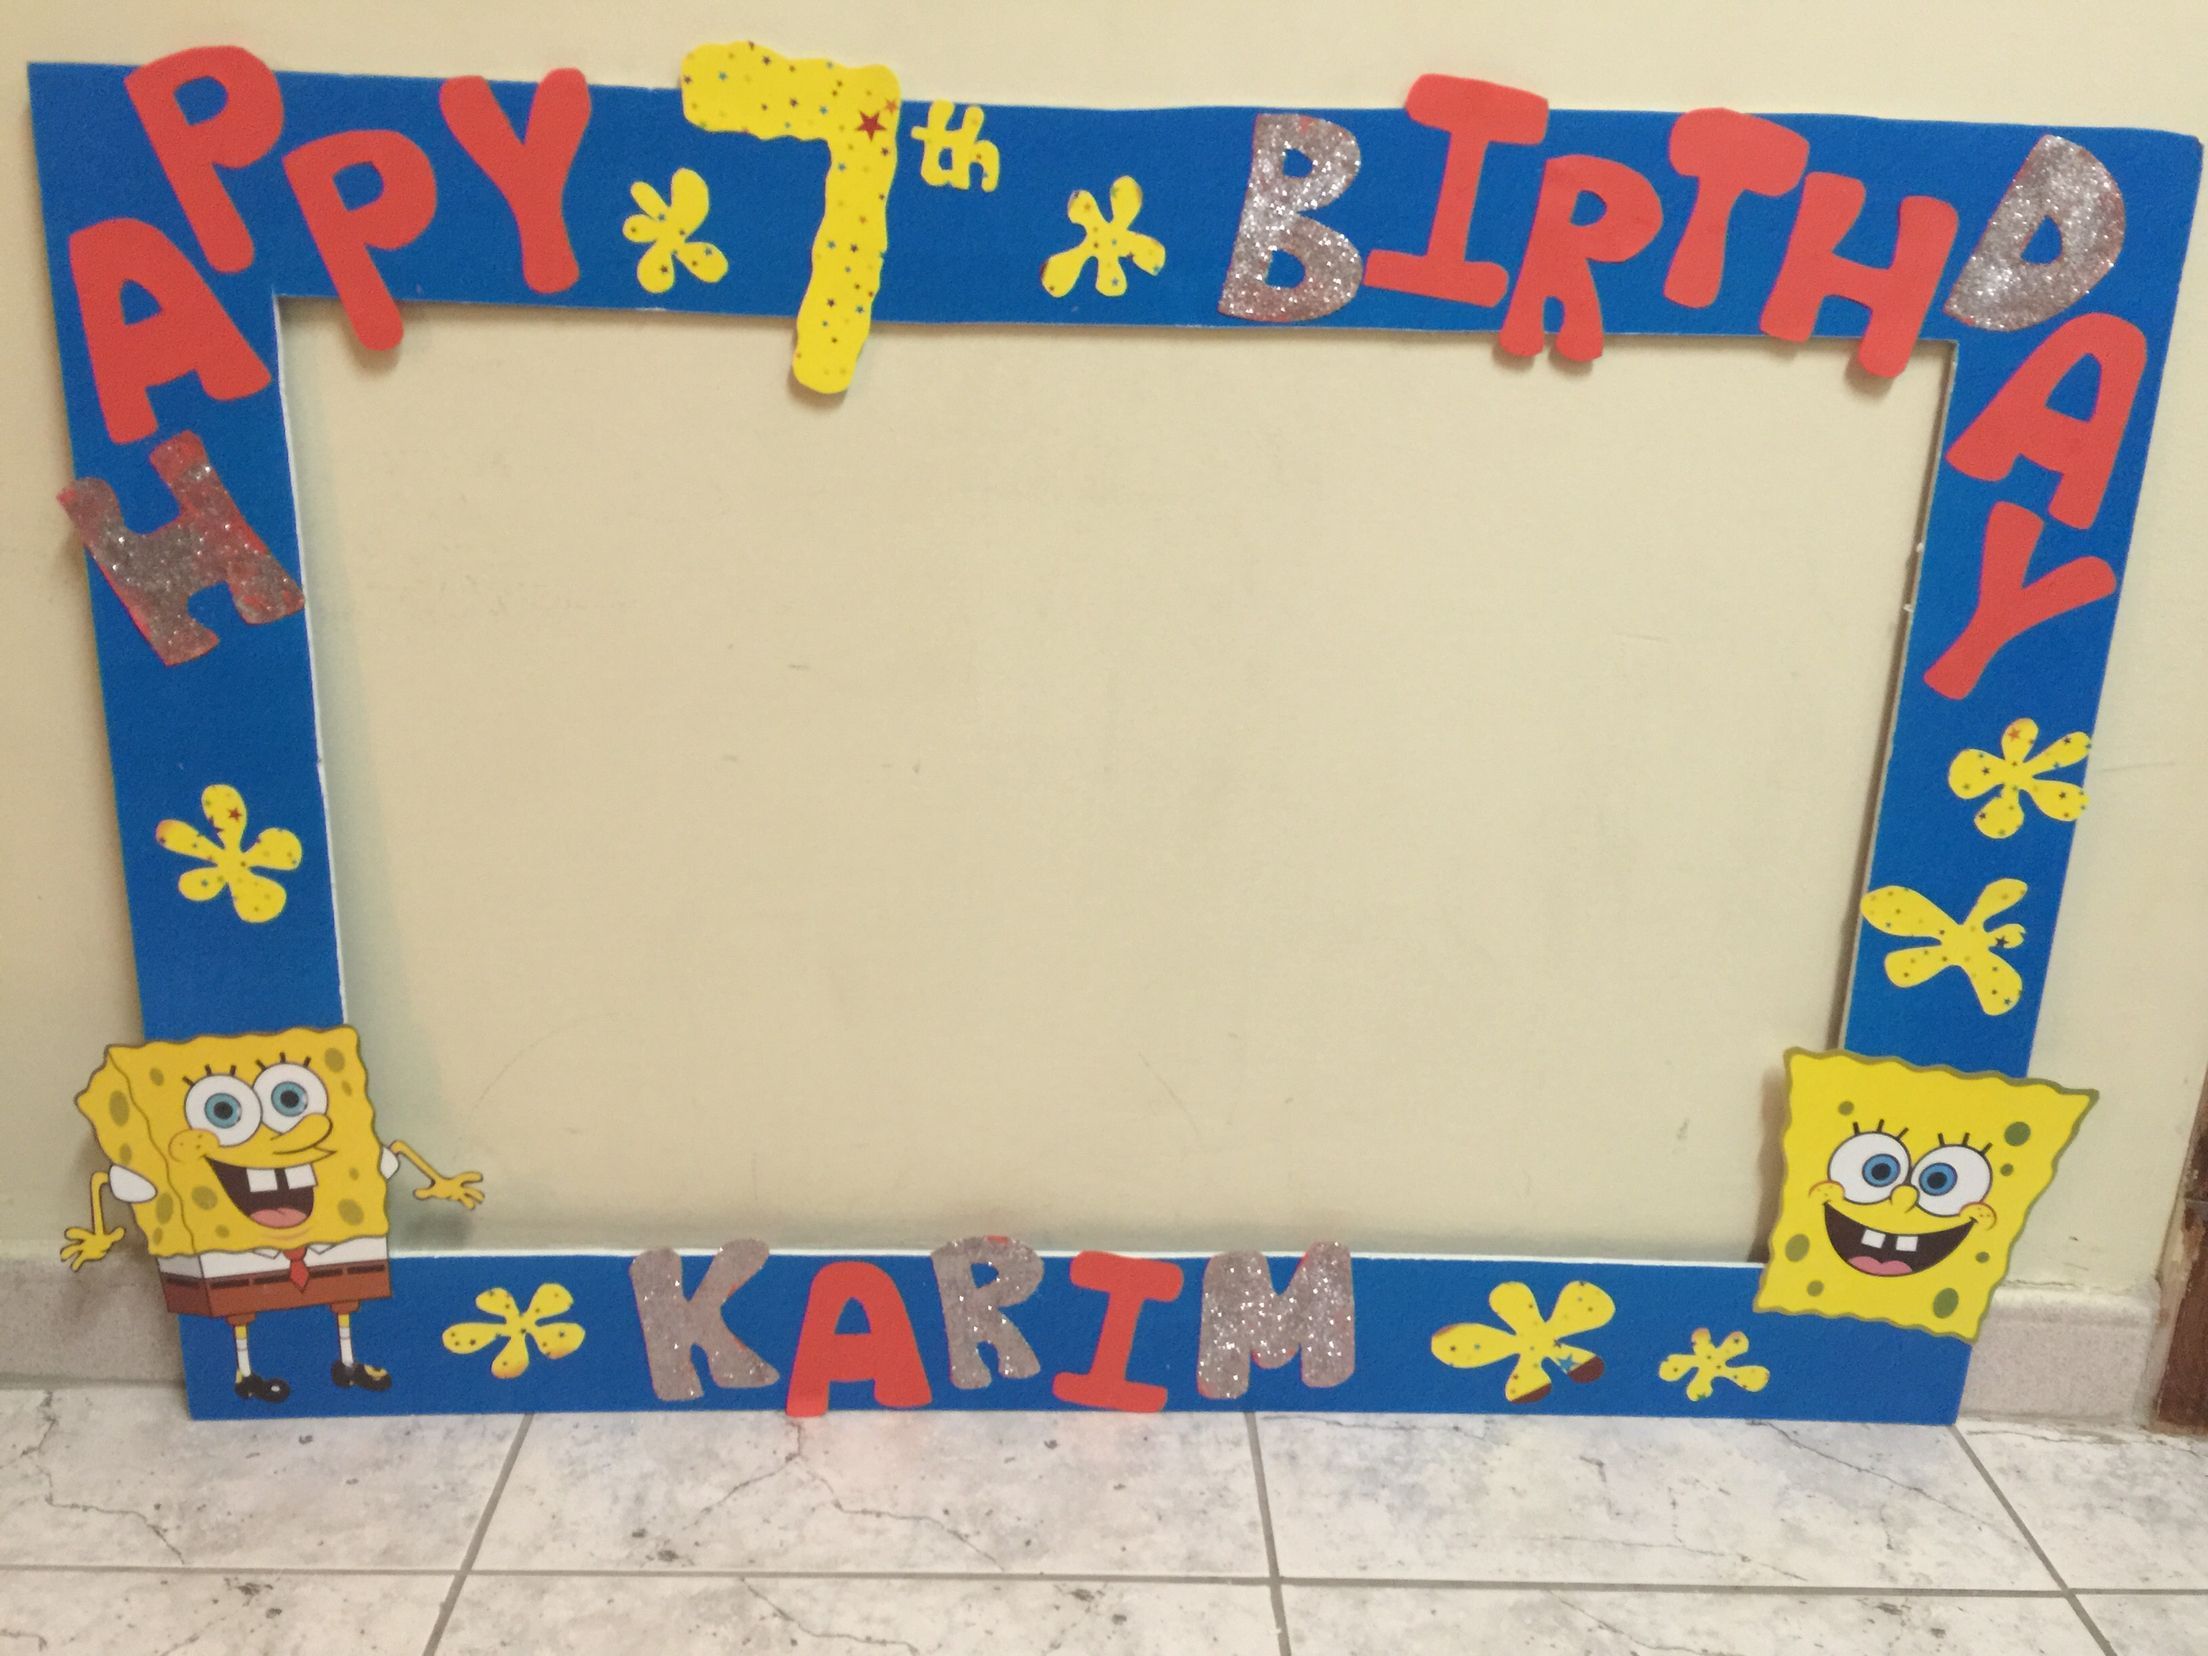 Spongebob birthday theme photo booth frame   Photobooth frames ...